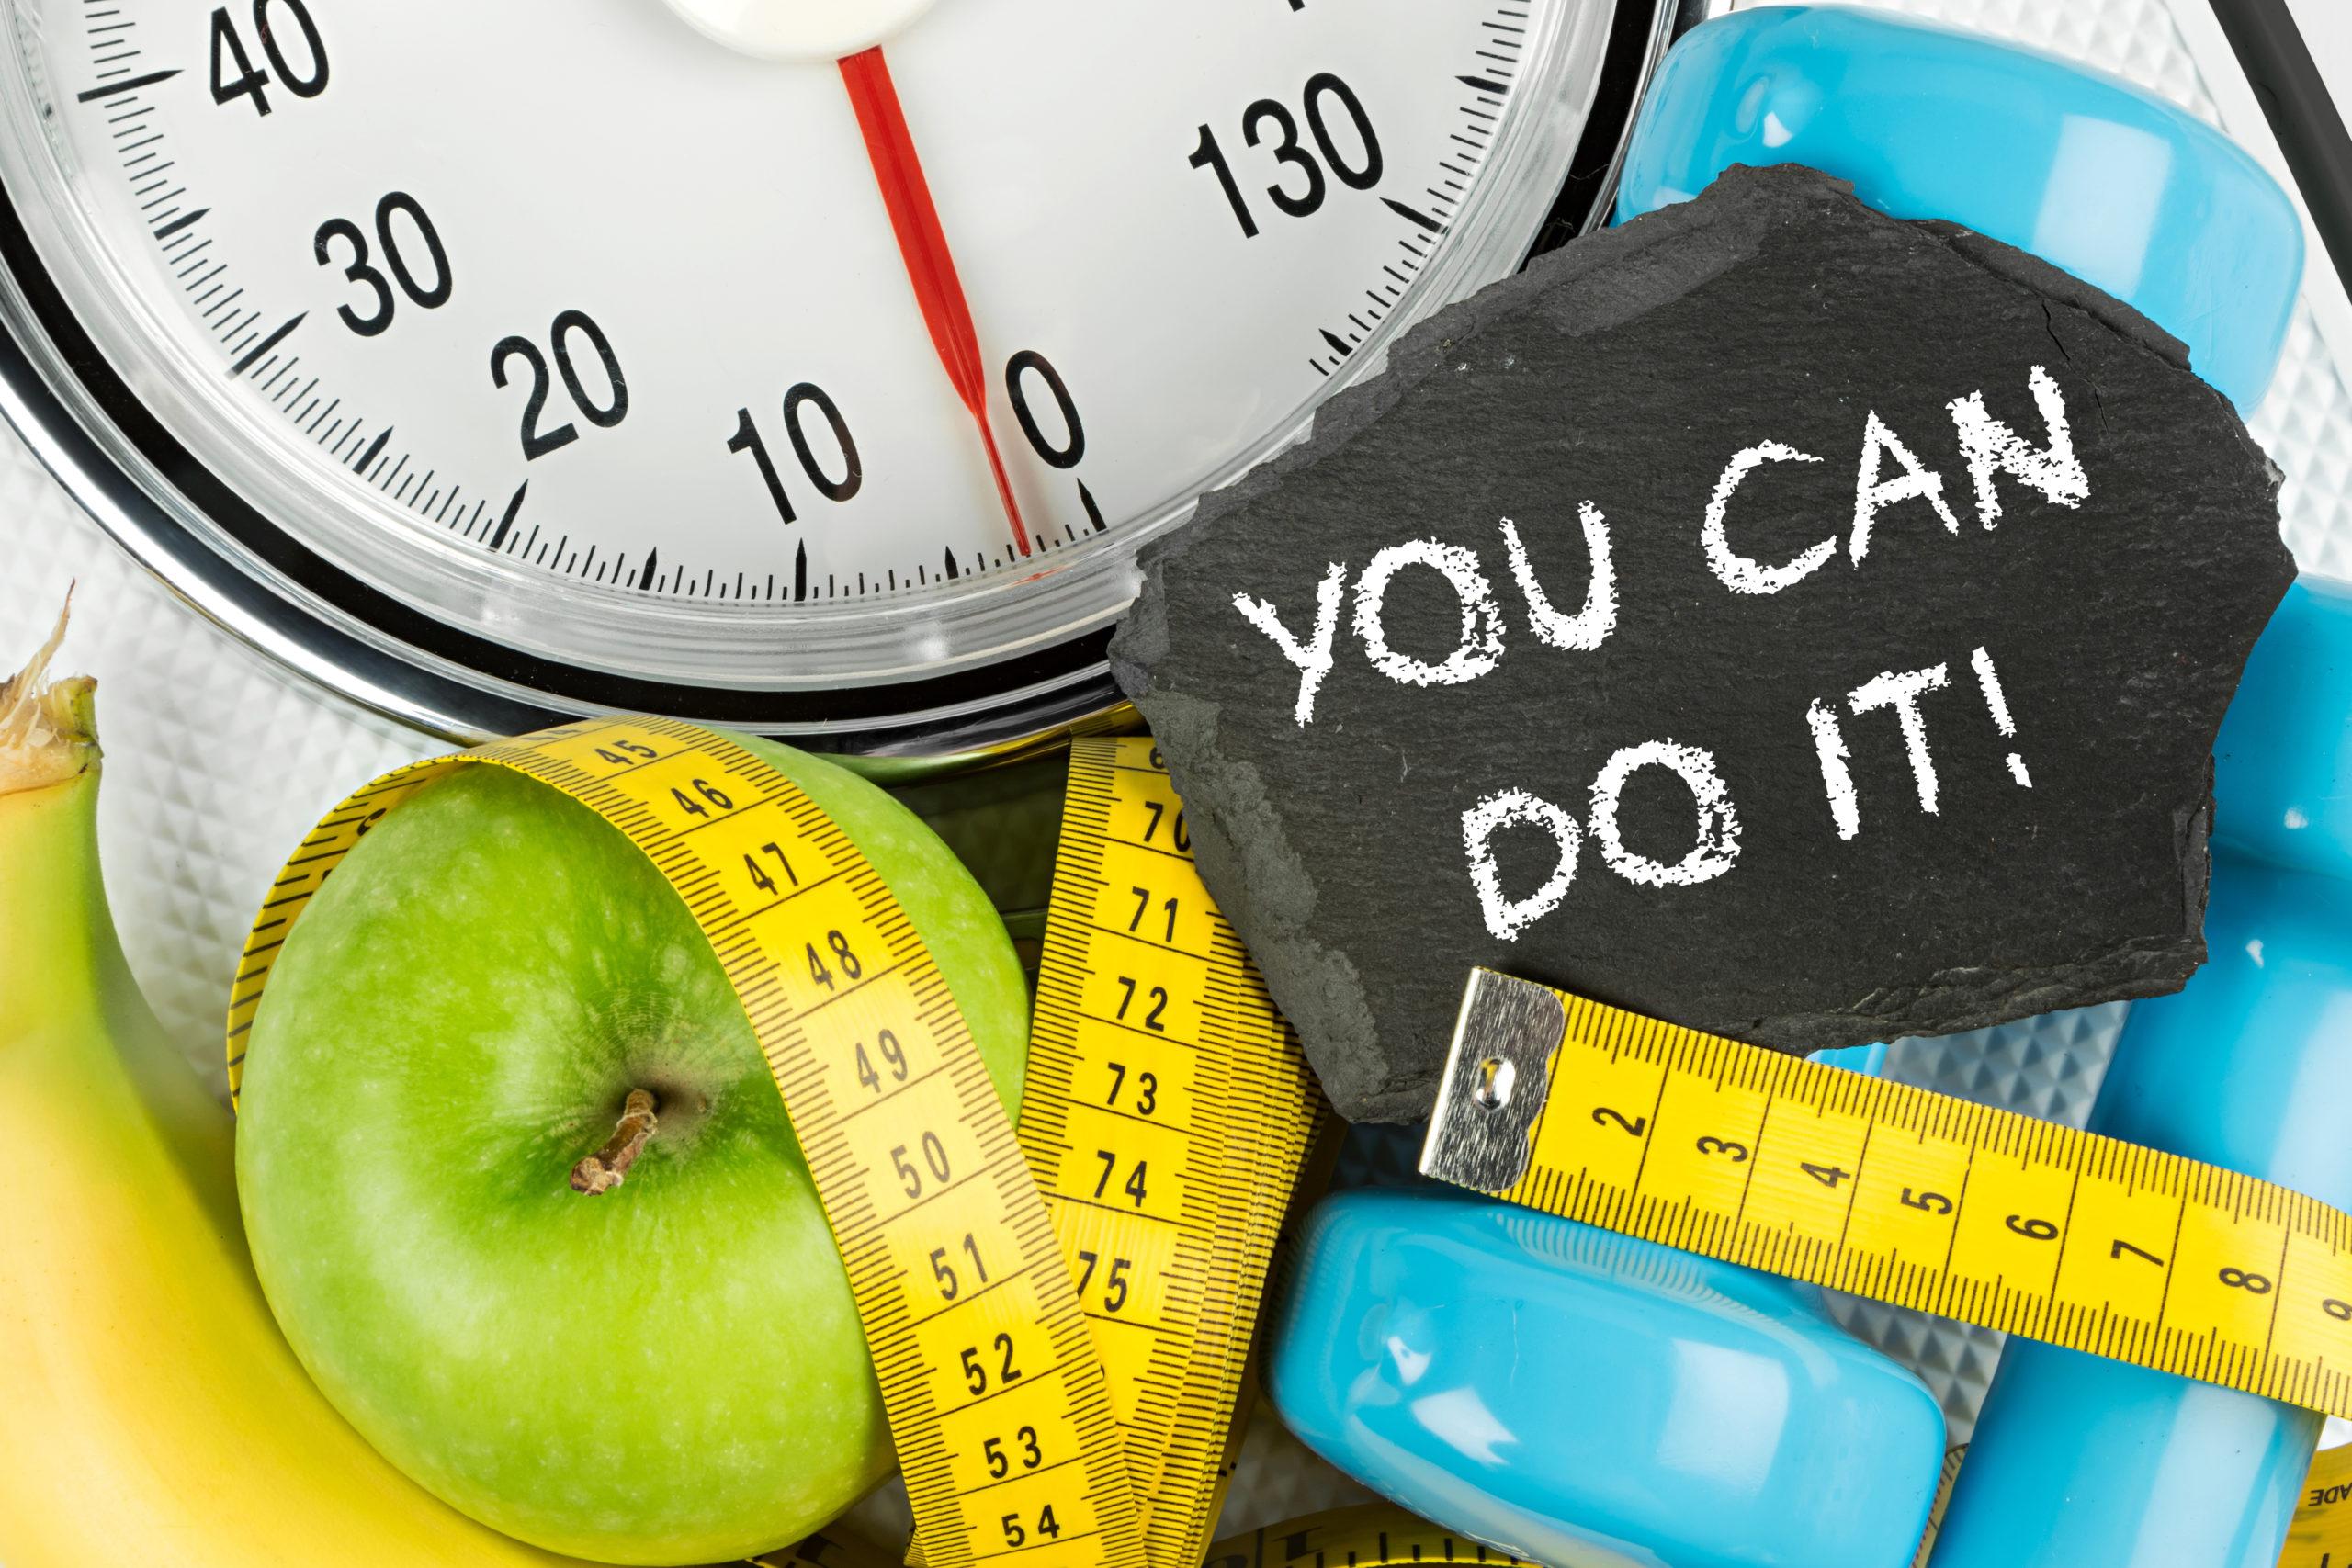 scapa de burta, scapa de grasime, fitness, gym, workout, abs workout, workout program, dieta, slabire, dieta de slabit rapid, cura de slabire rapida, cura de slabire eficienta